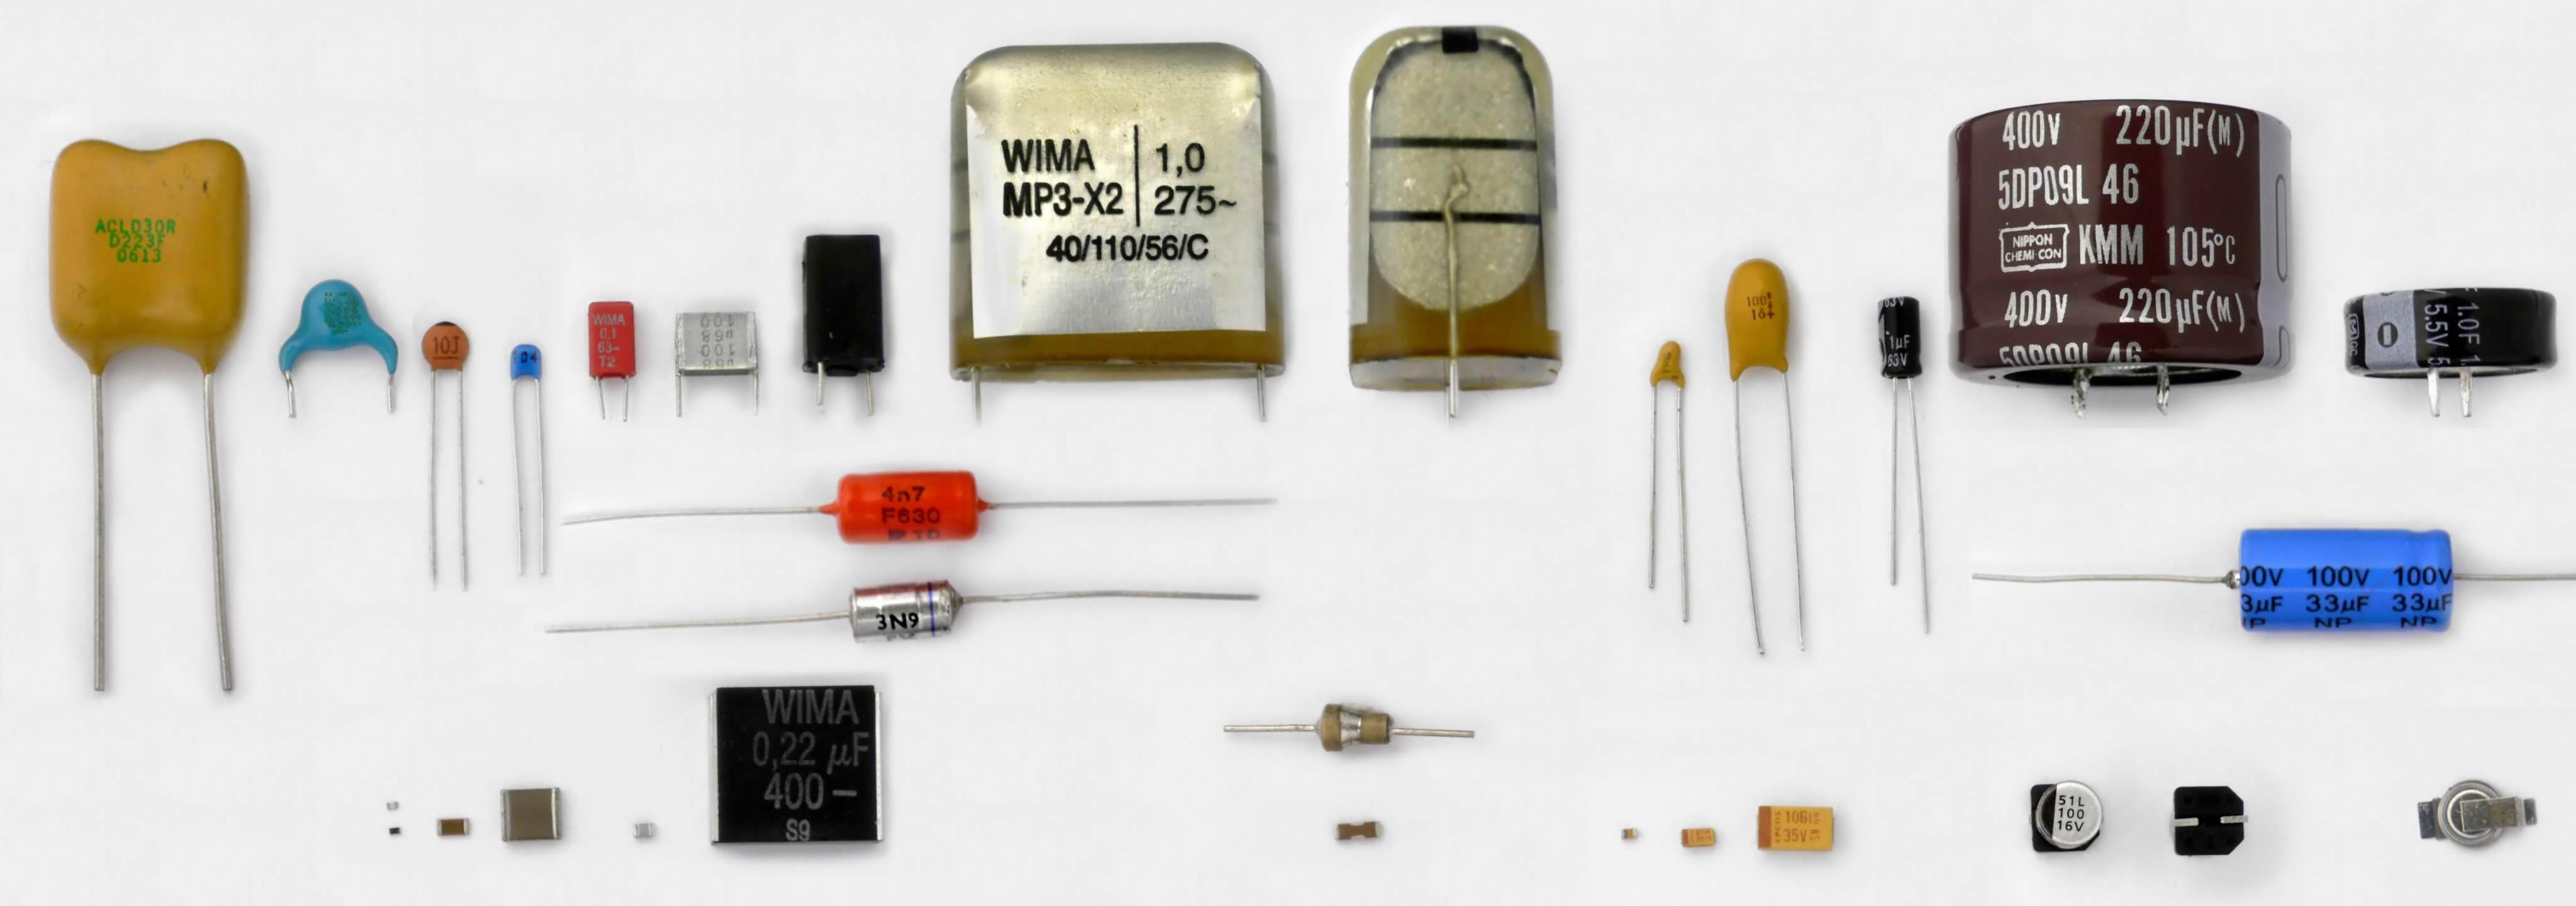 Електричний конденсатор Wikiwand